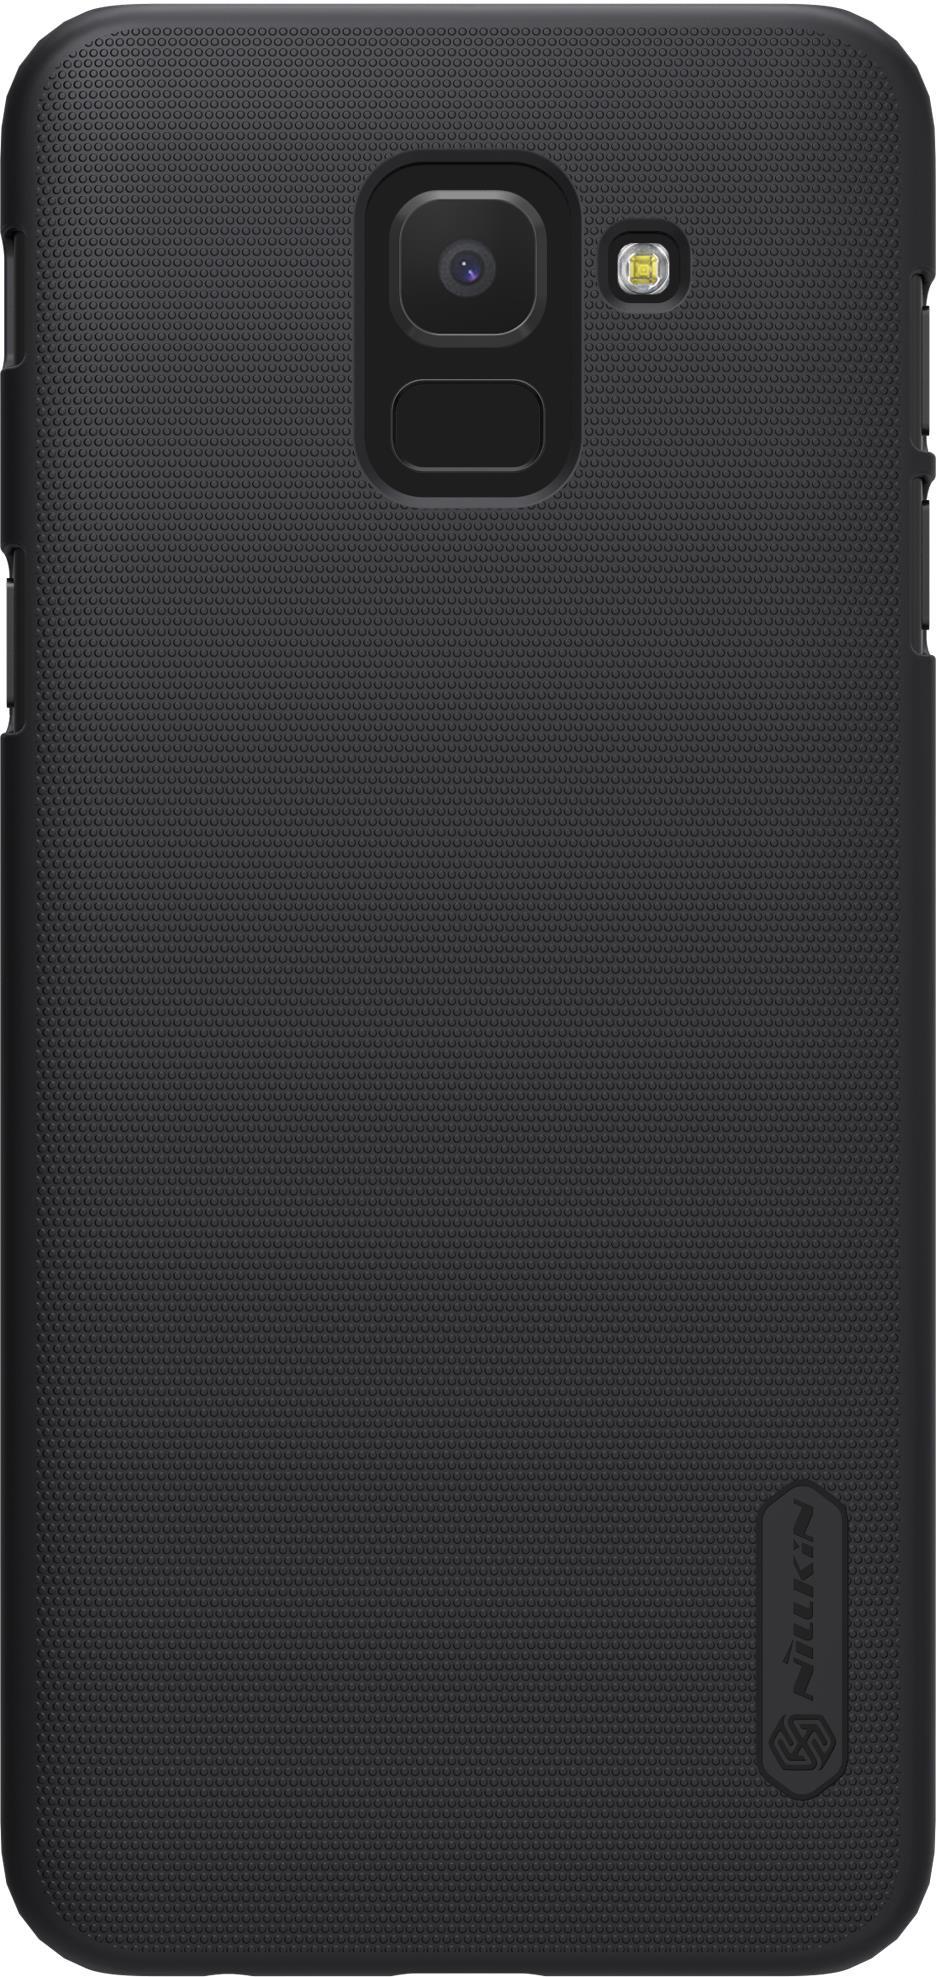 Накладка Nillkin Super Frosted для Galaxy J6, 6902048159365, черный